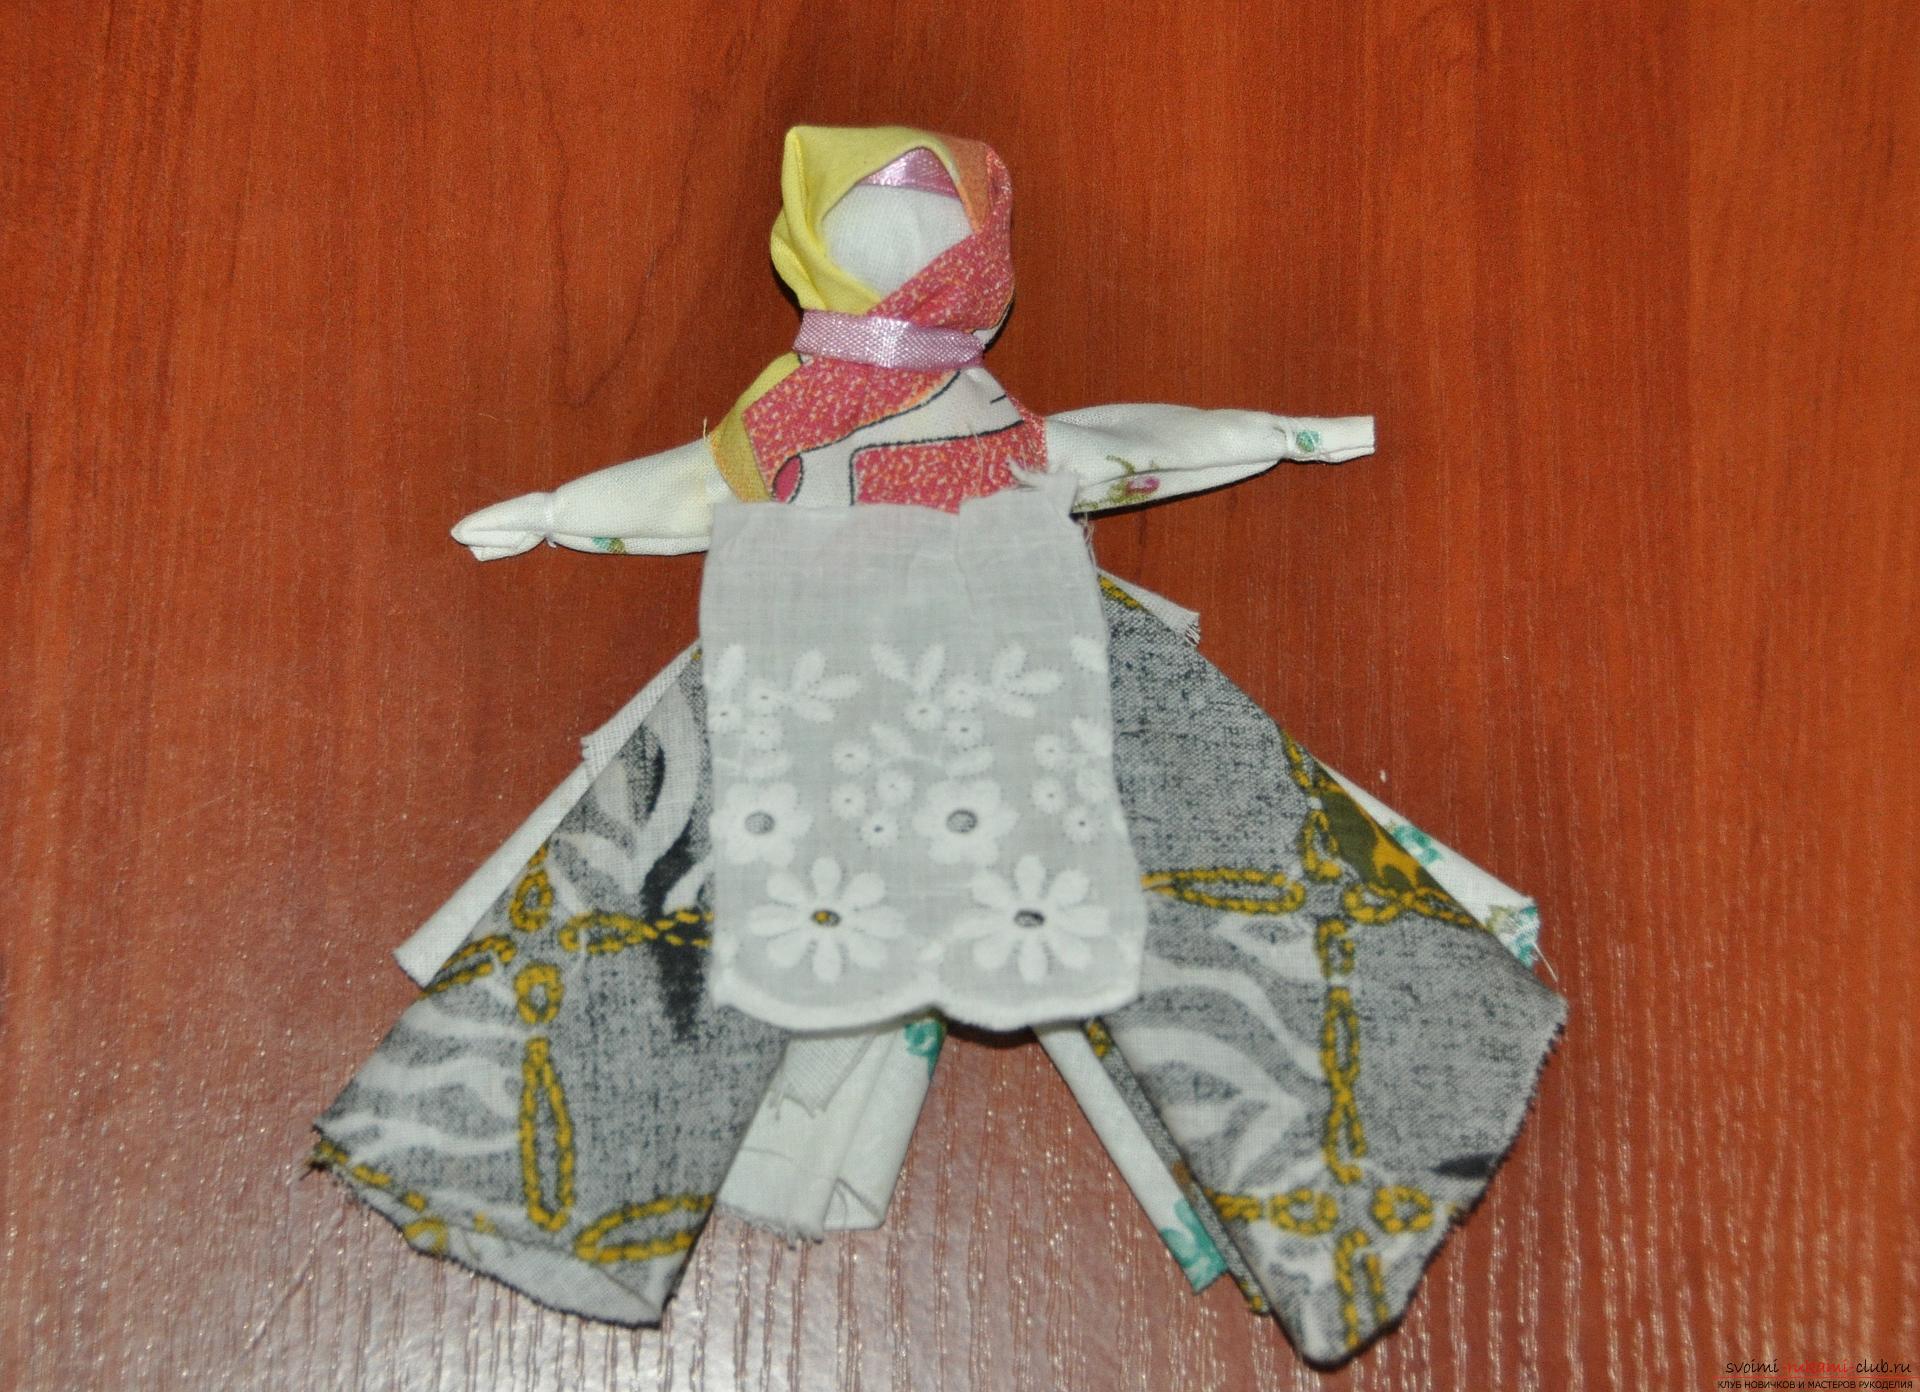 Этот мастер-класс научит как изготовить своими руками куклу-берегиню - столбушку. Фото №23